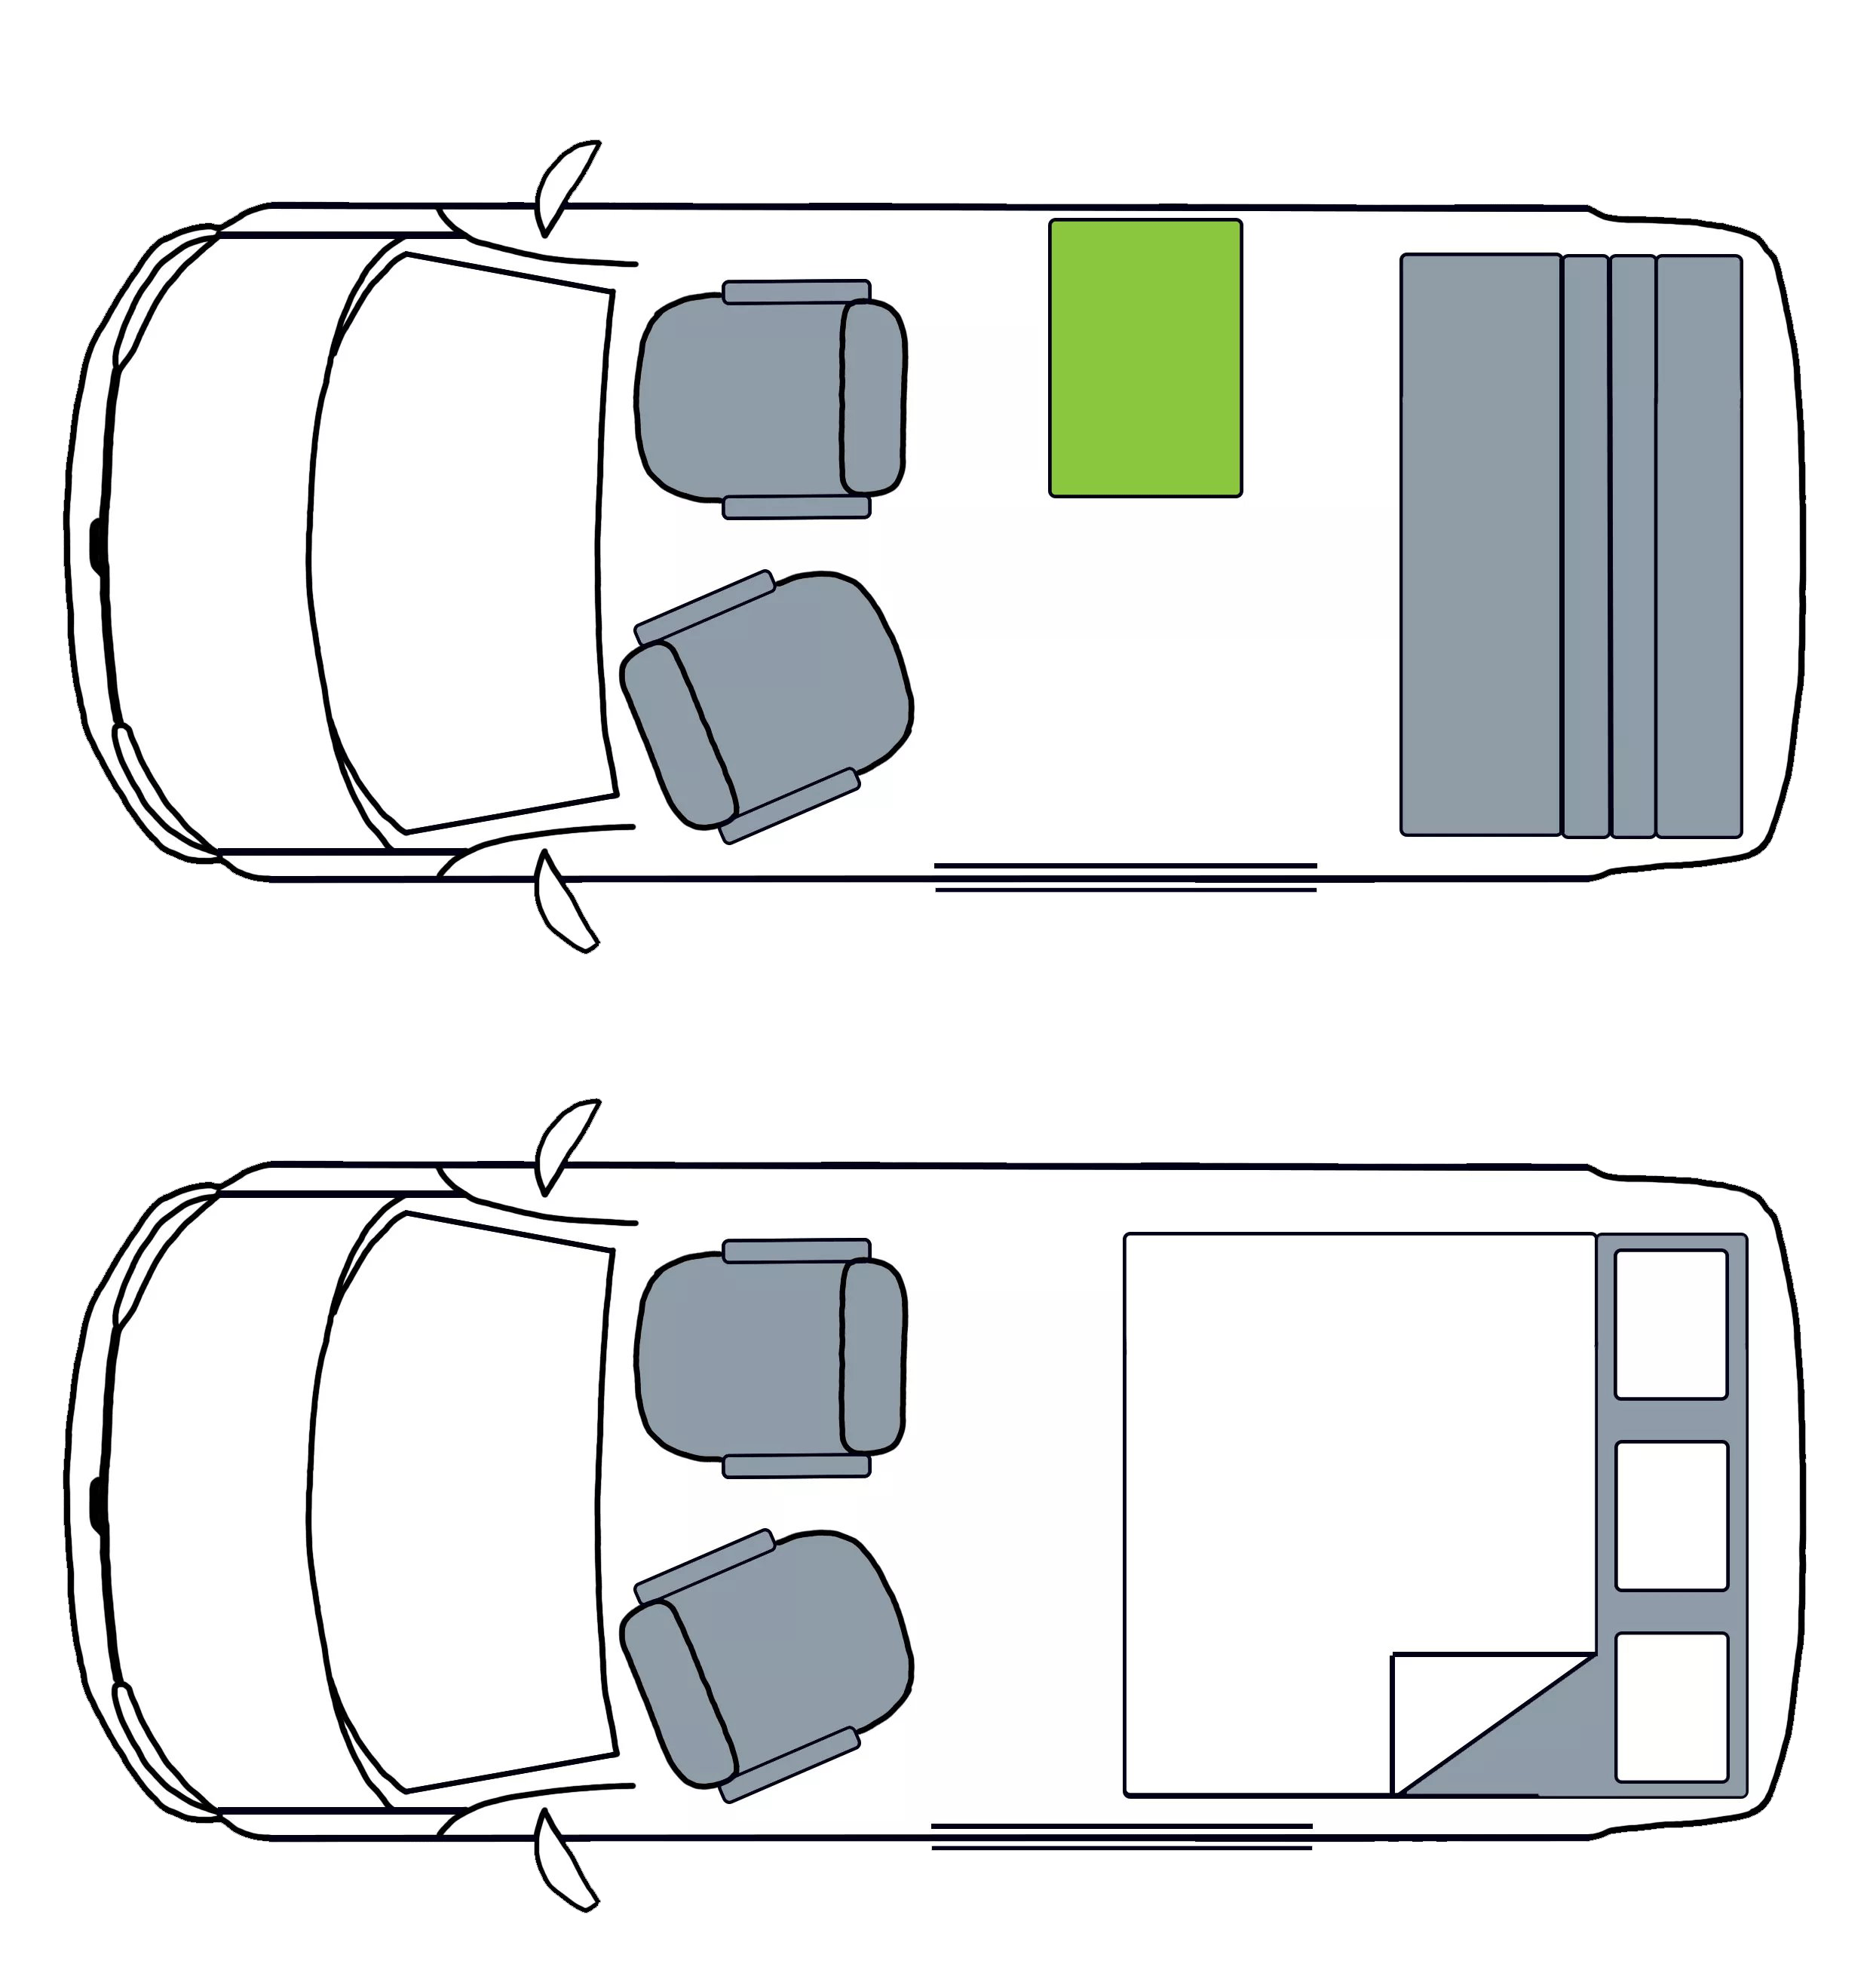 VW Vanworx Chilli conversion